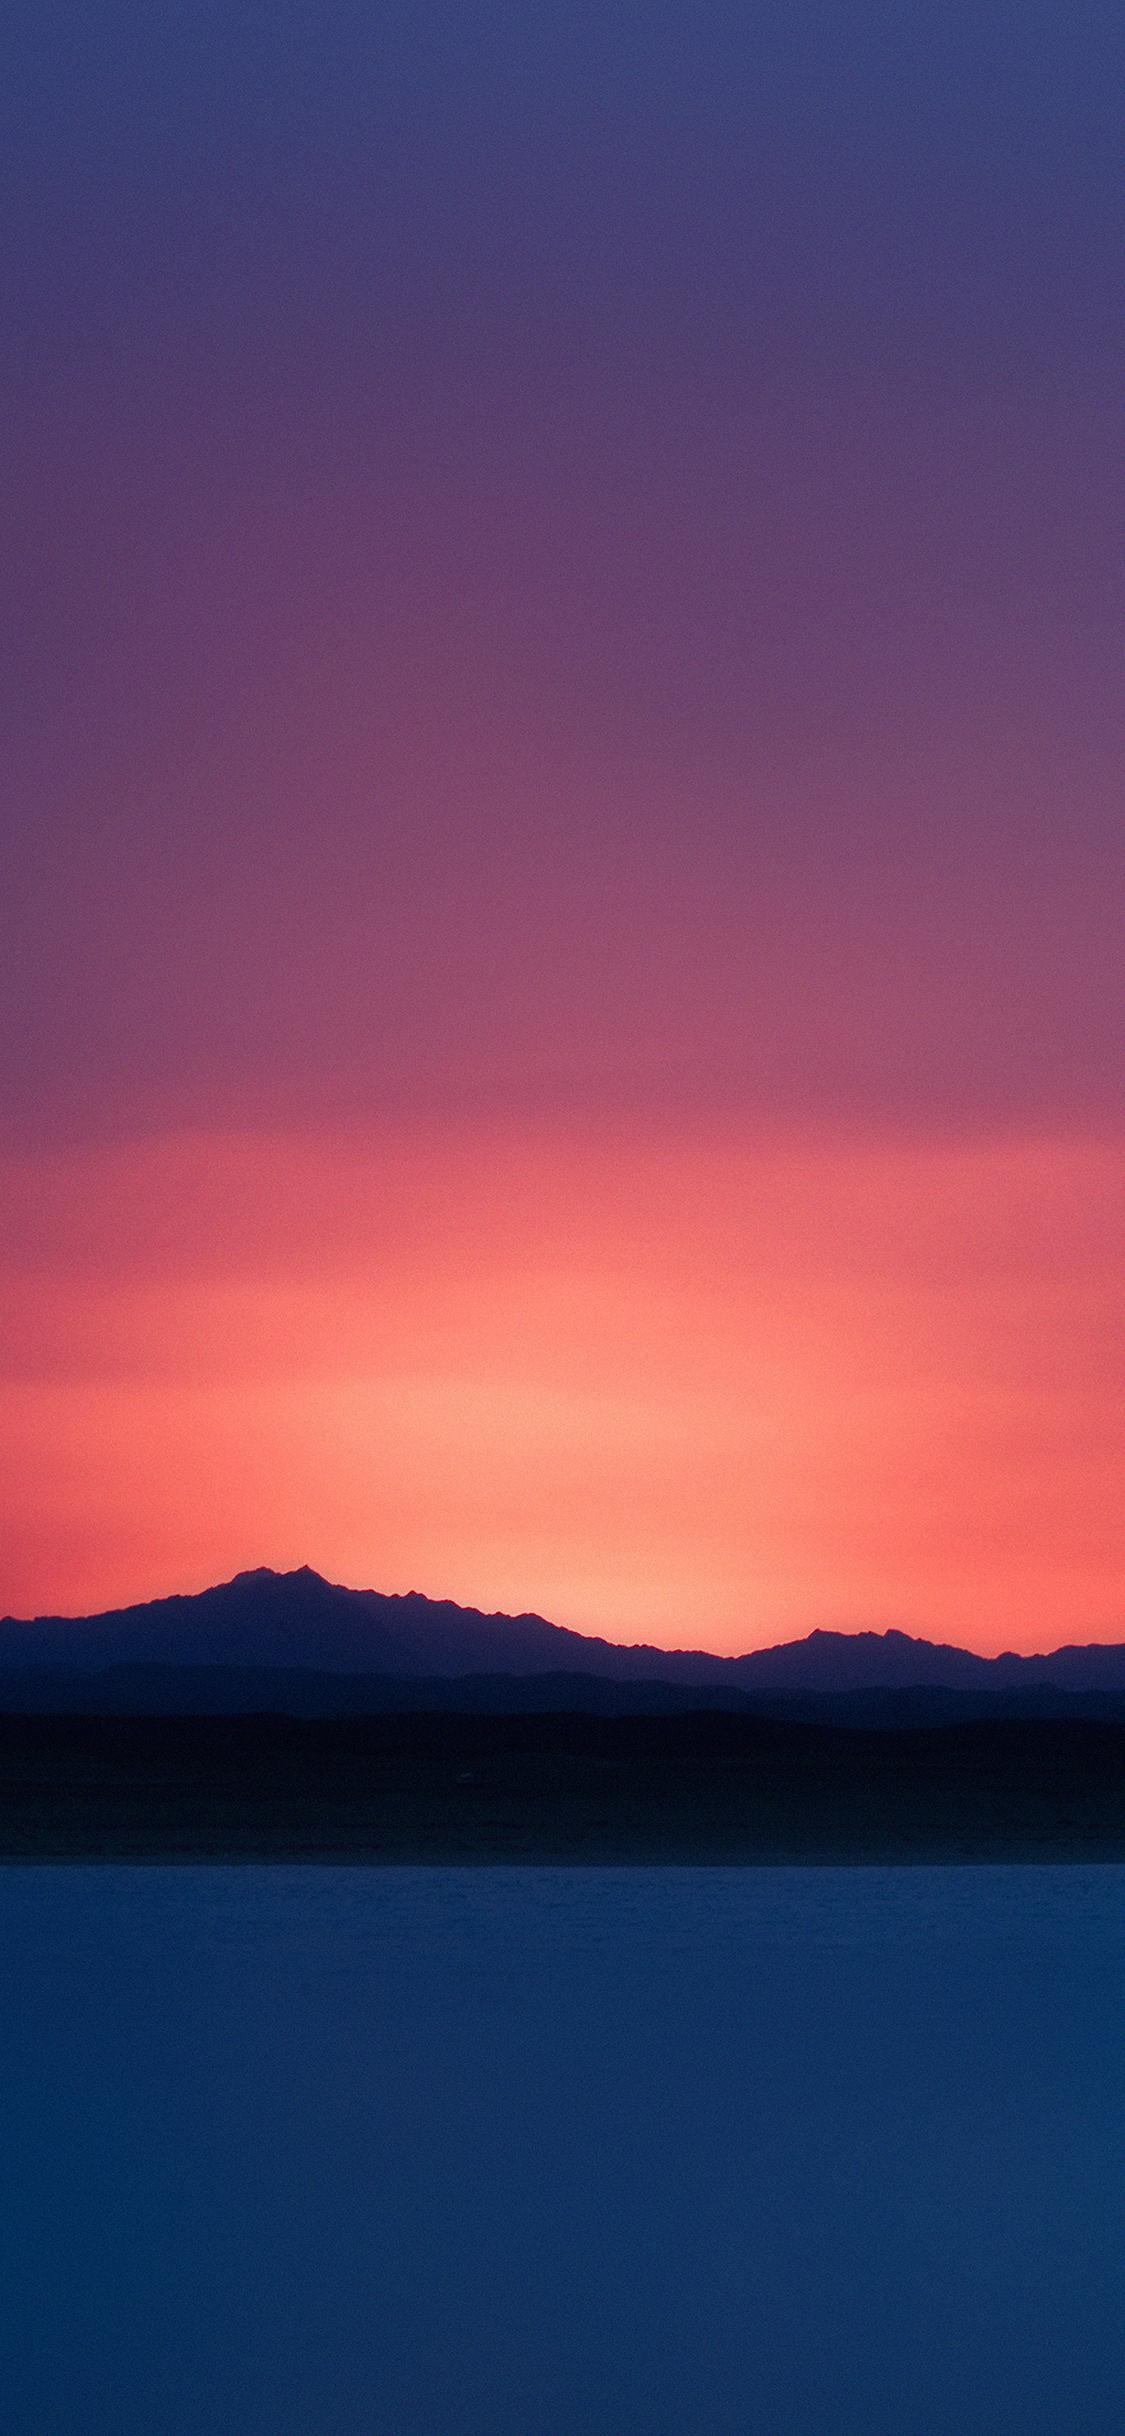 iPhoneXpapers.com-Apple-iPhone-wallpaper-mf70-sunset-lake-mountain-dark-night